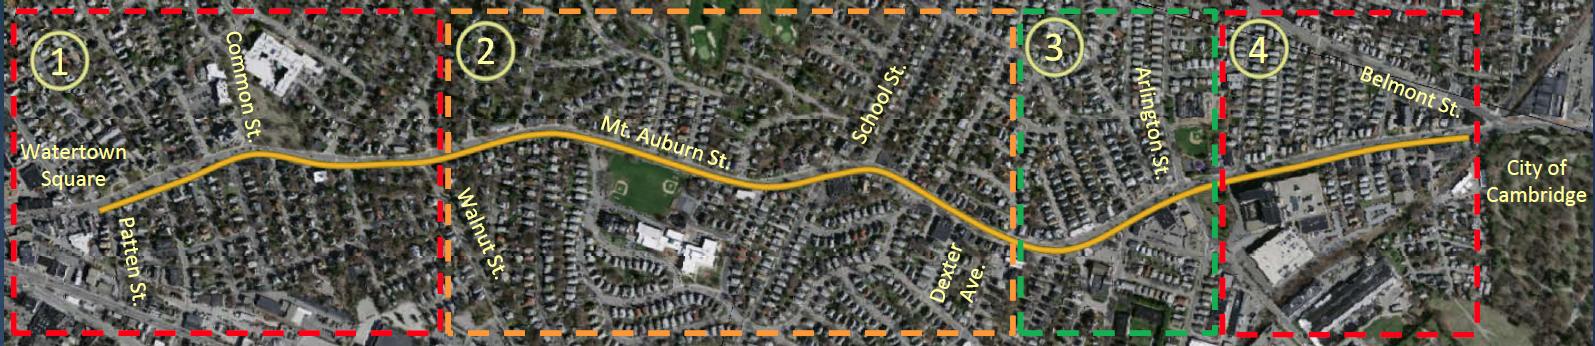 The Mount Auburn Street corridor, broken into four segments: (1) Patten Street to Walnut Street, (2) Walnut Street to Dexter Avenue, (3) Dexter Avenue to Arlington Street (Coolidge Square), (4) Prentiss Street to Cambridge city line.